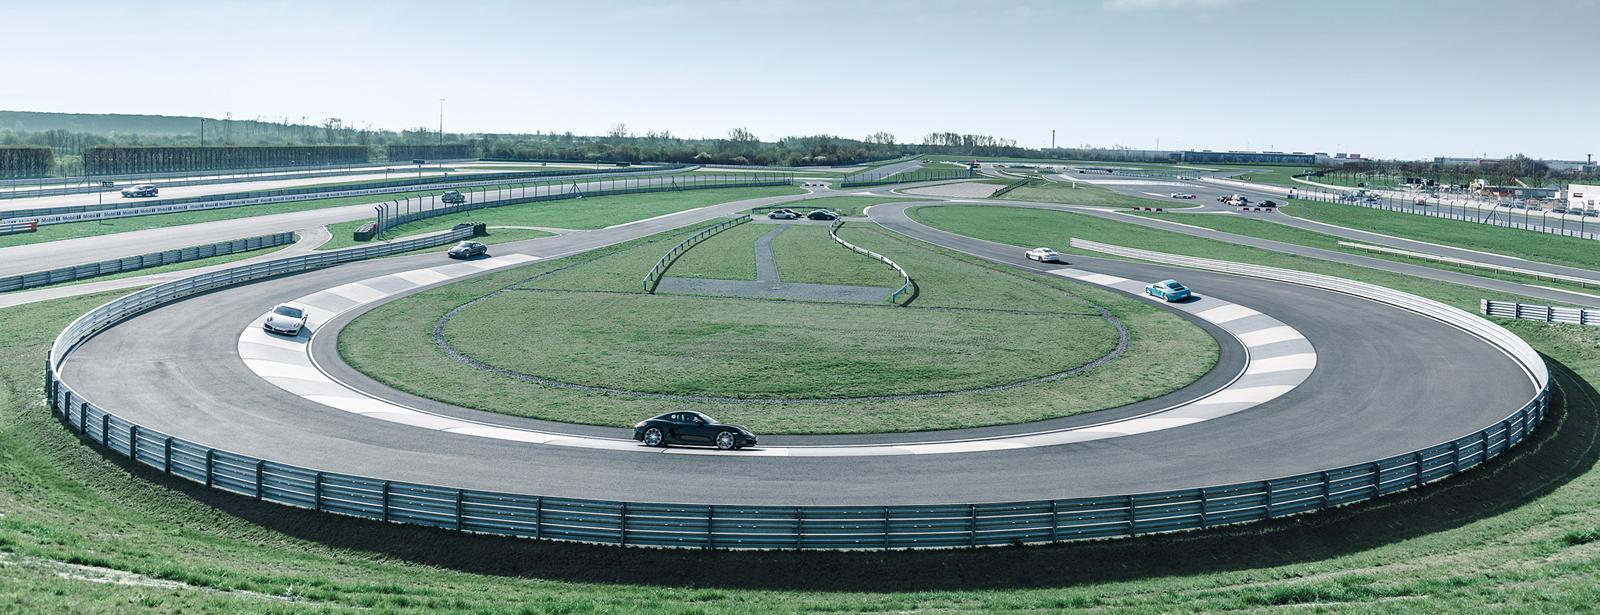 Events 2019   Sportfahrtraining L'Anneau du Rhin